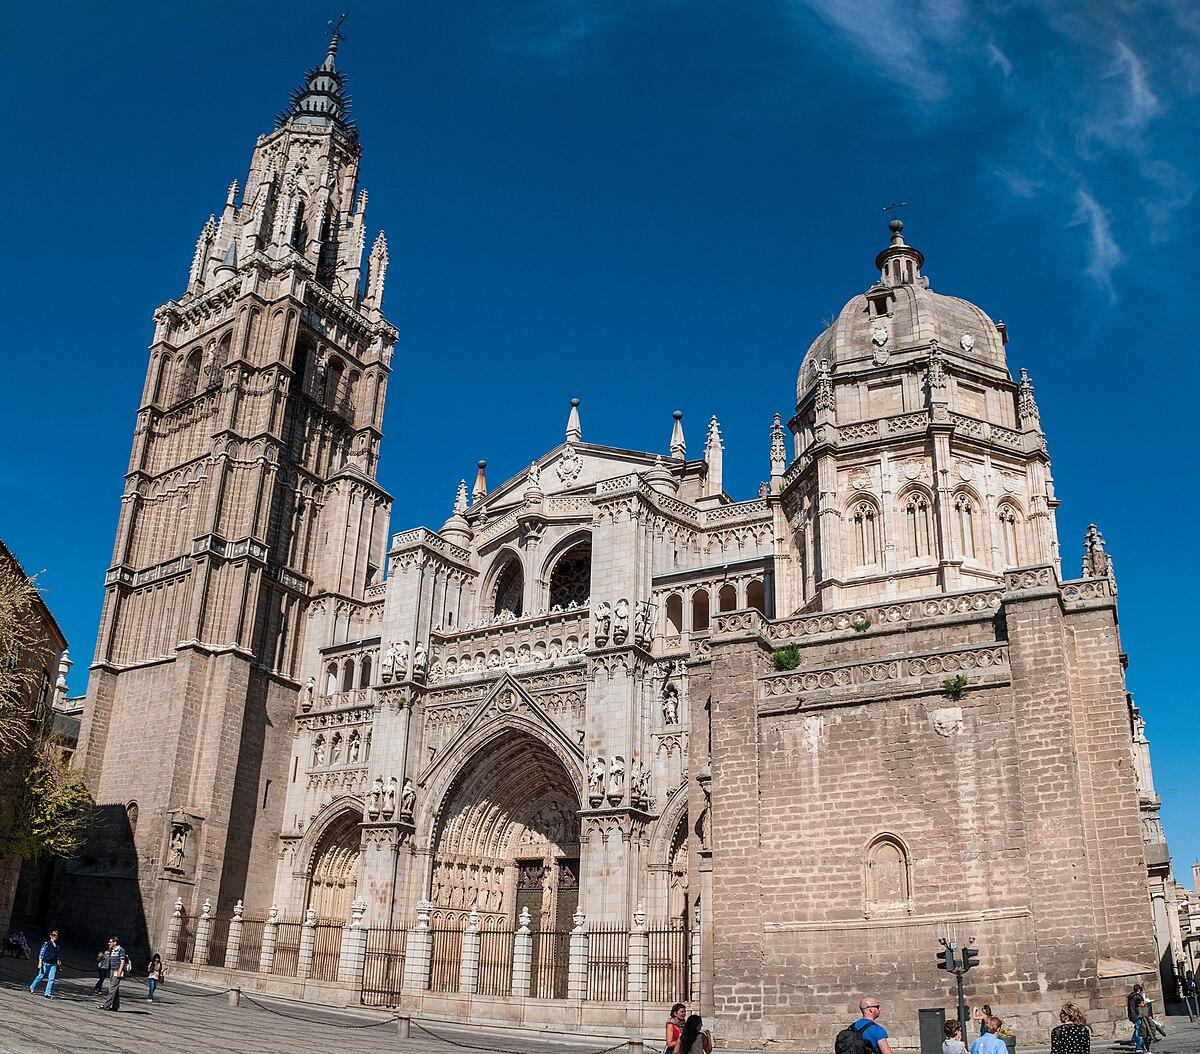 Catedral de toledo wikipedia la enciclopedia libre for Arquitectura de espana